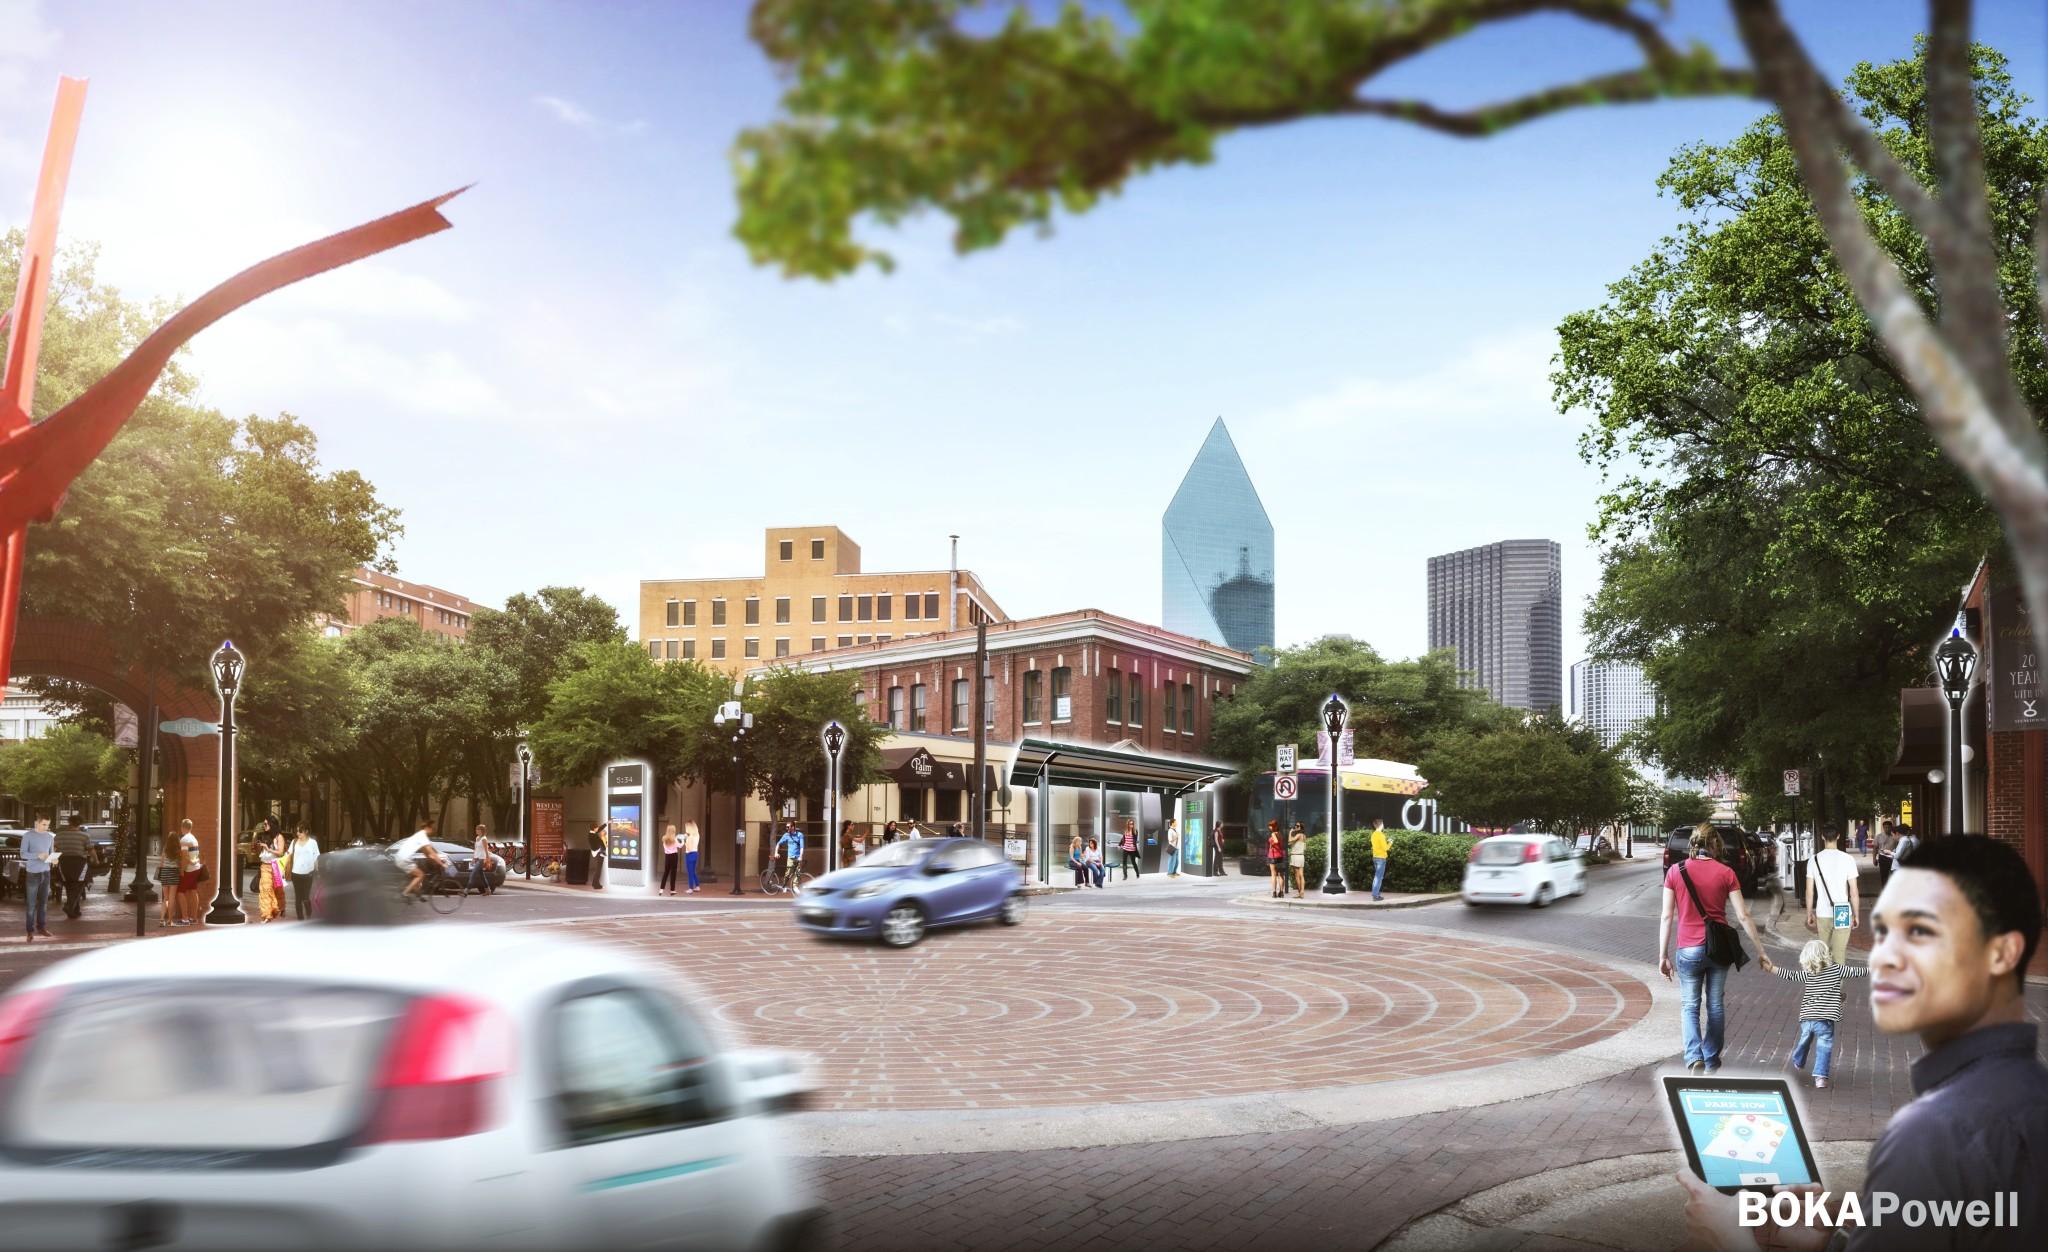 Smart-City-Street-View-Dallas West End